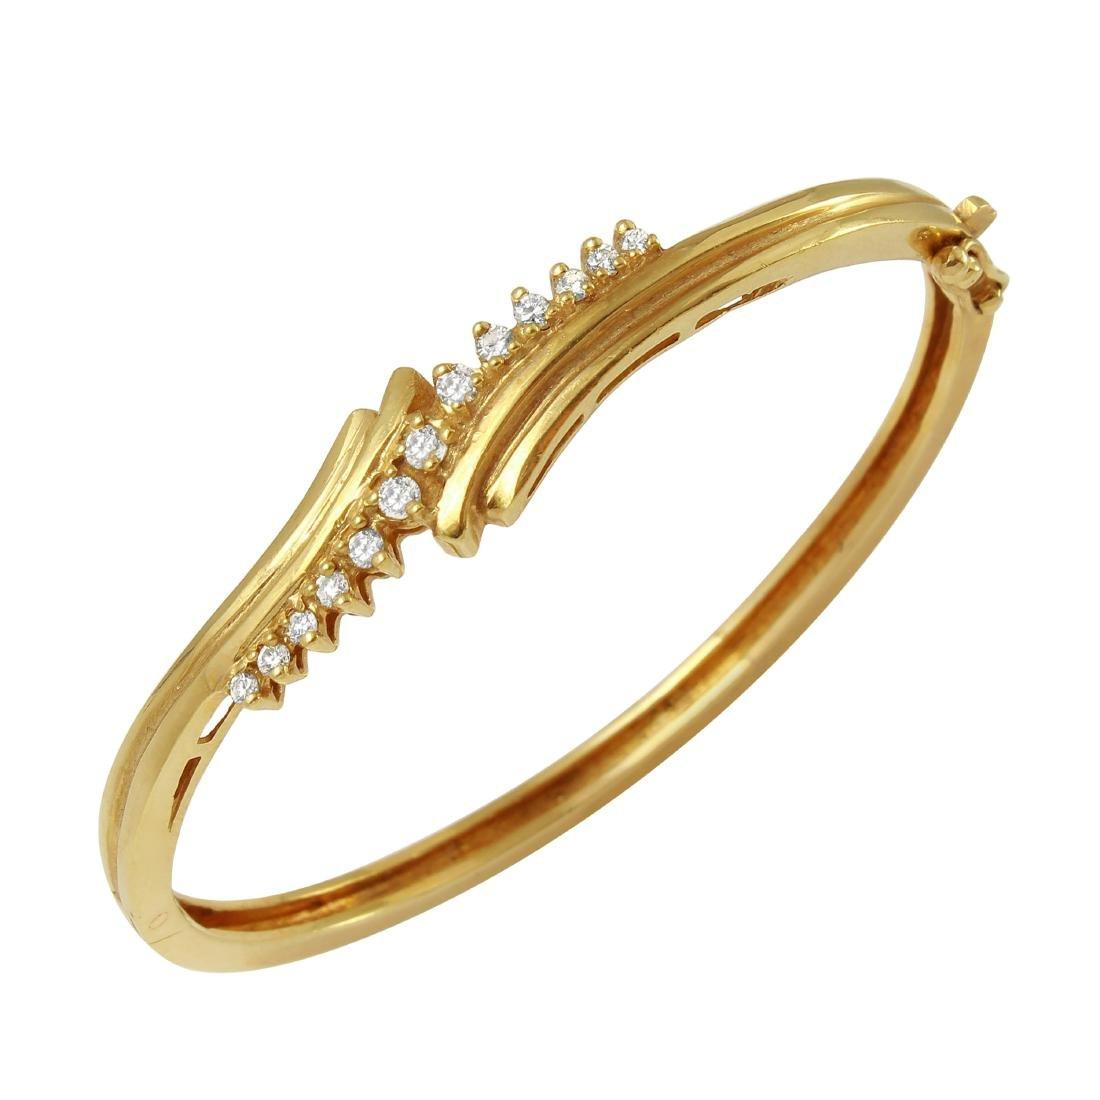 14KT Yellow Gold Diamond Bangle Bracelet - 4